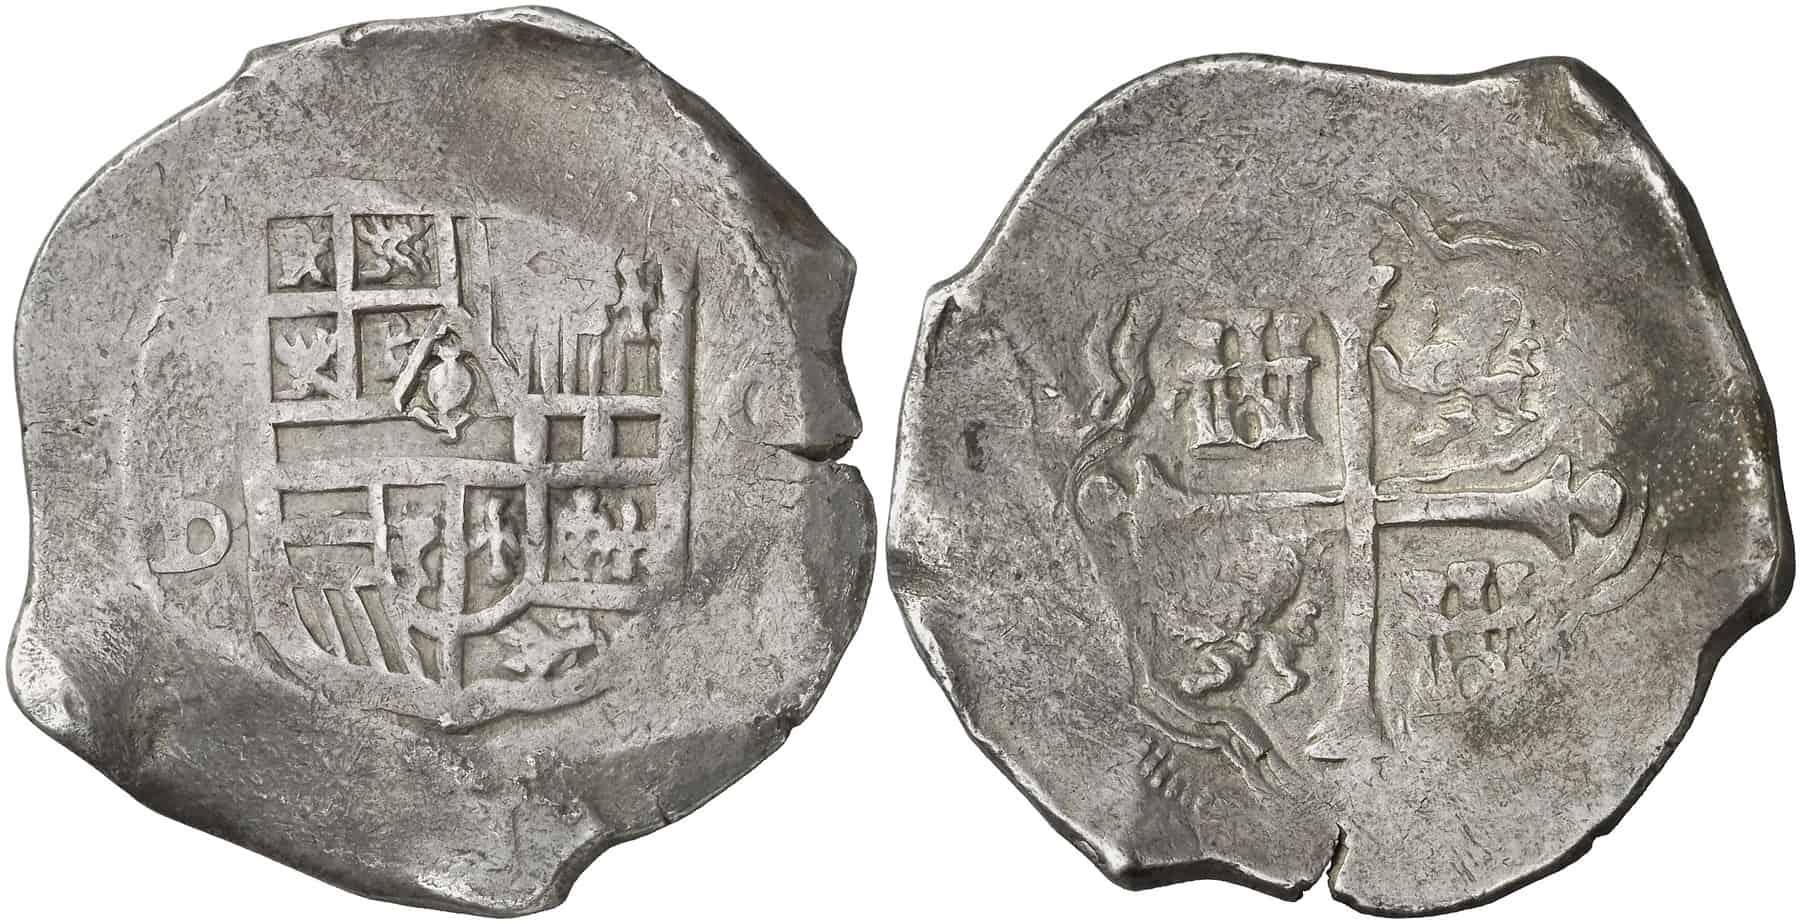 México. 8 reales. Felipe III